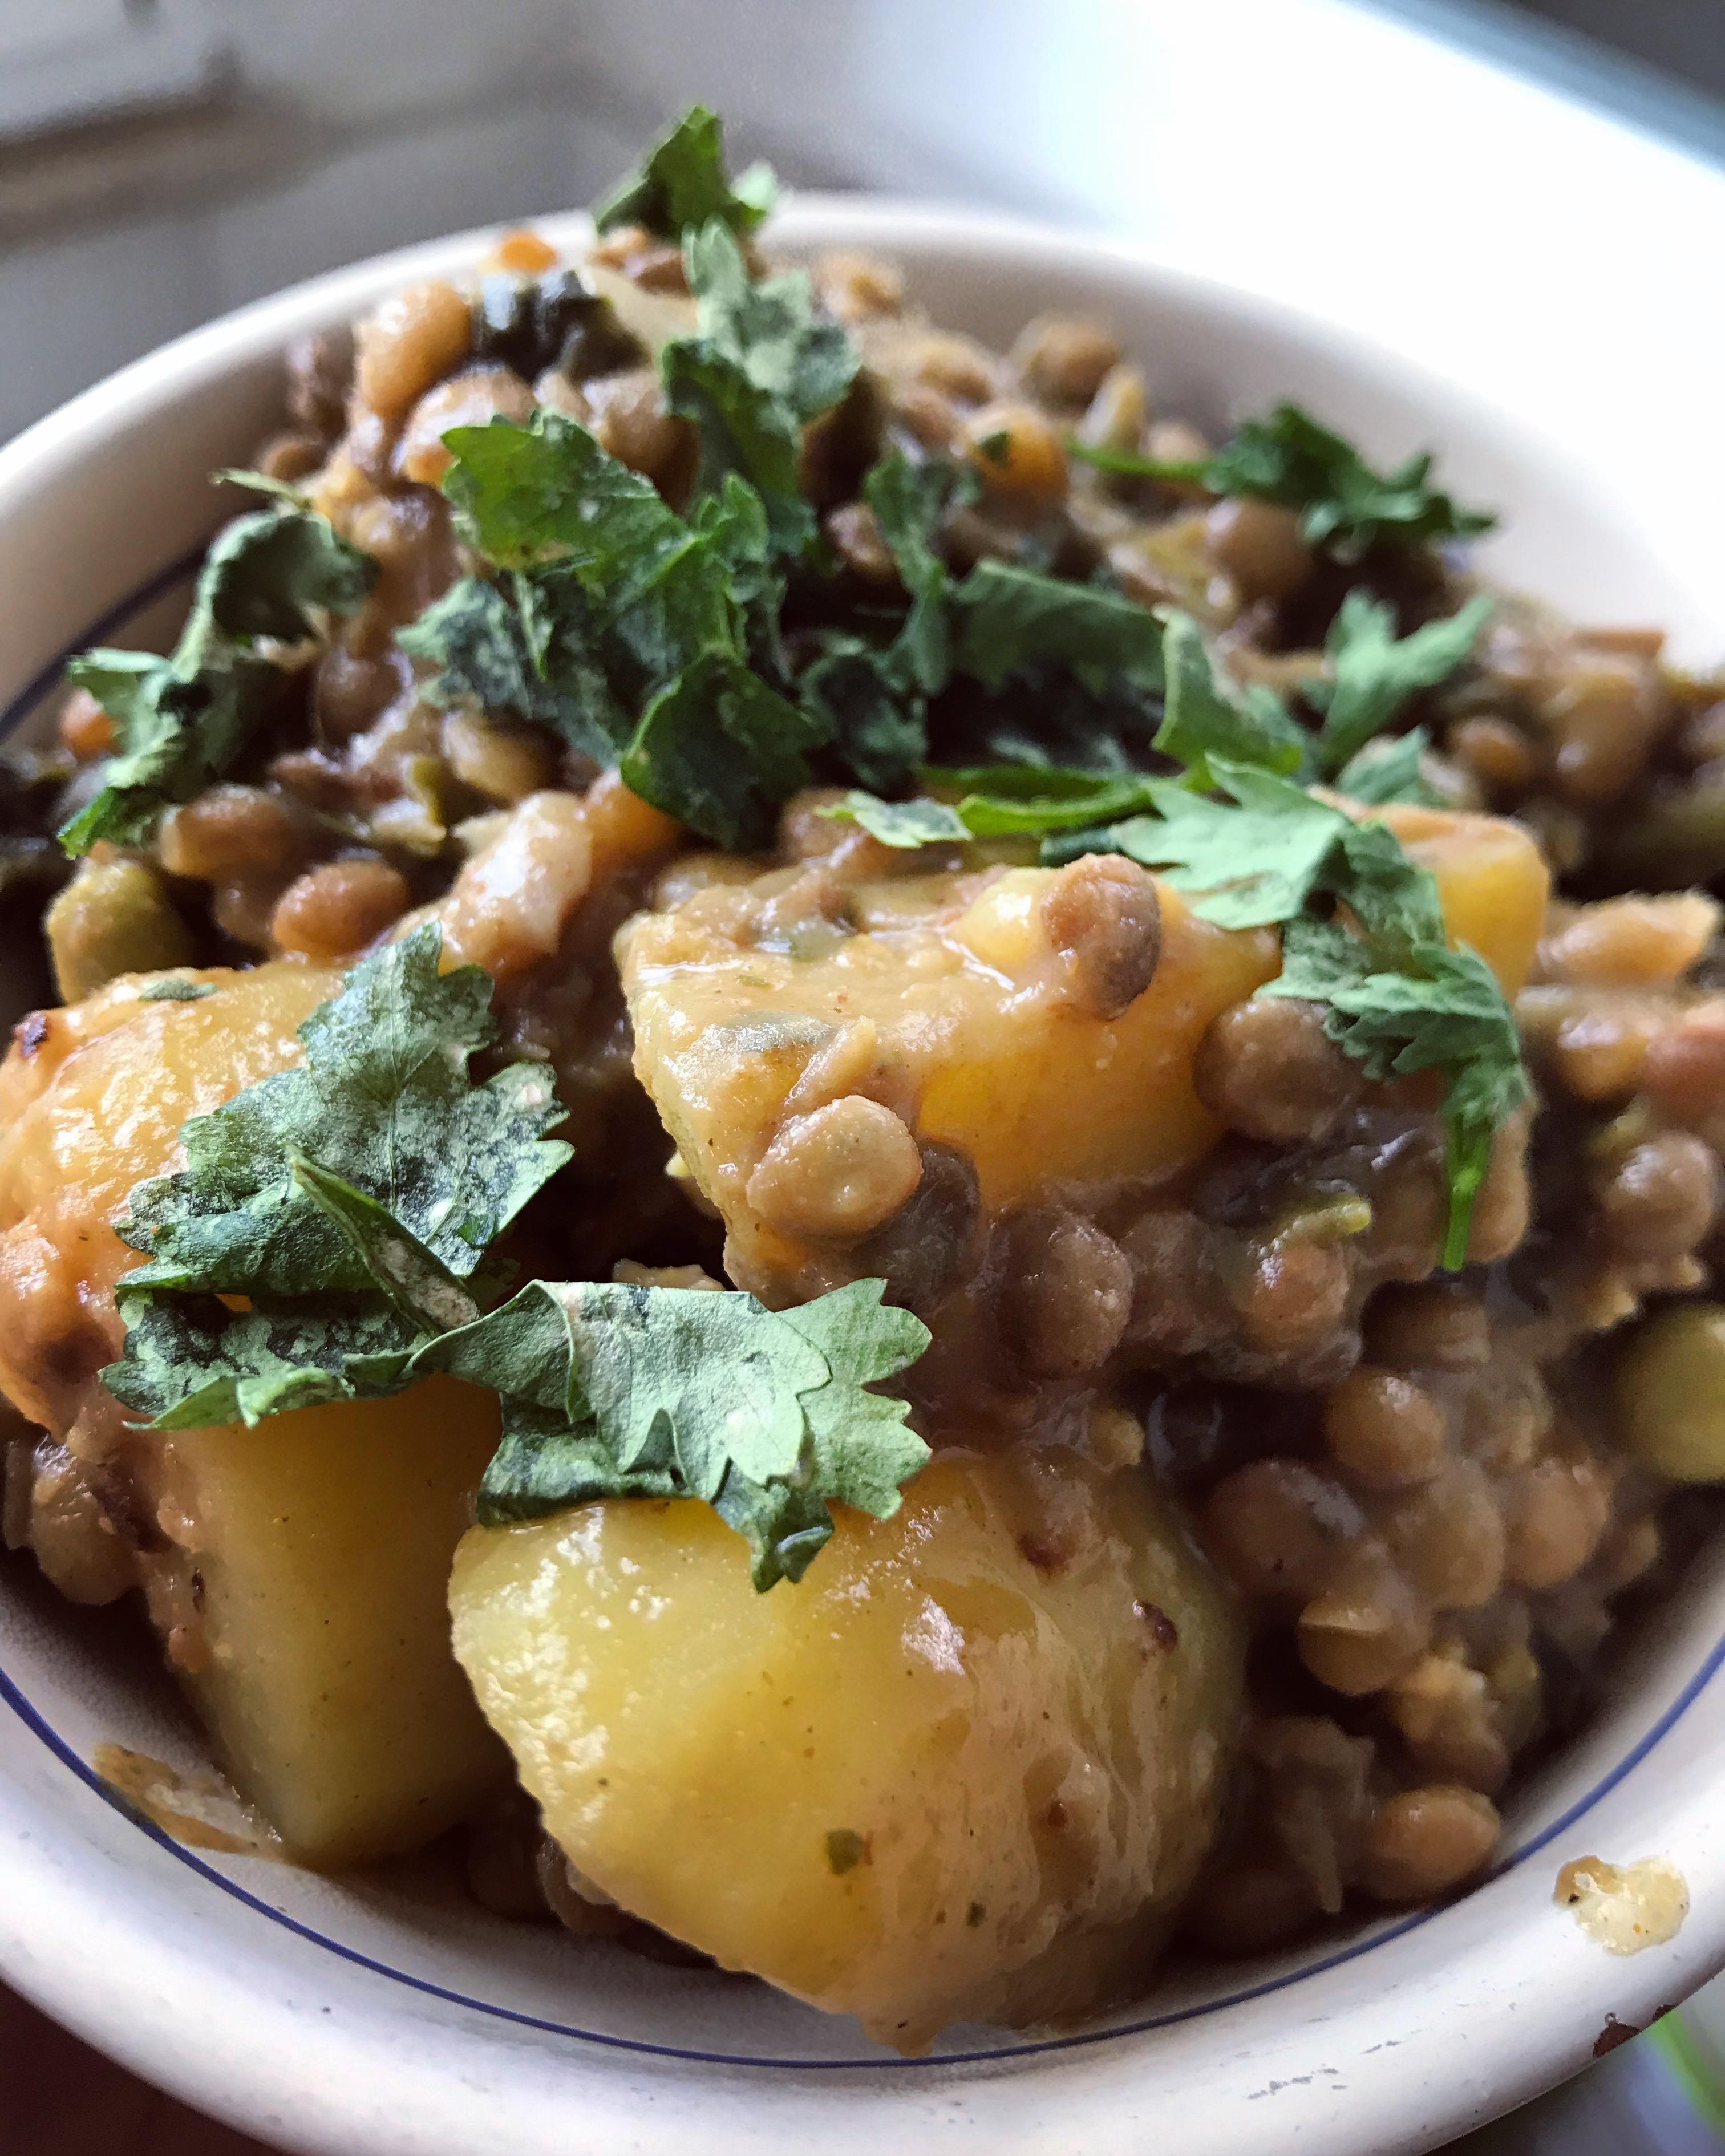 curry, lenticchie, patate, vegan, famiglia, masala, cucina indiana, etnico, mama rainbow, ricetta, sano, veloce, facile, bambini